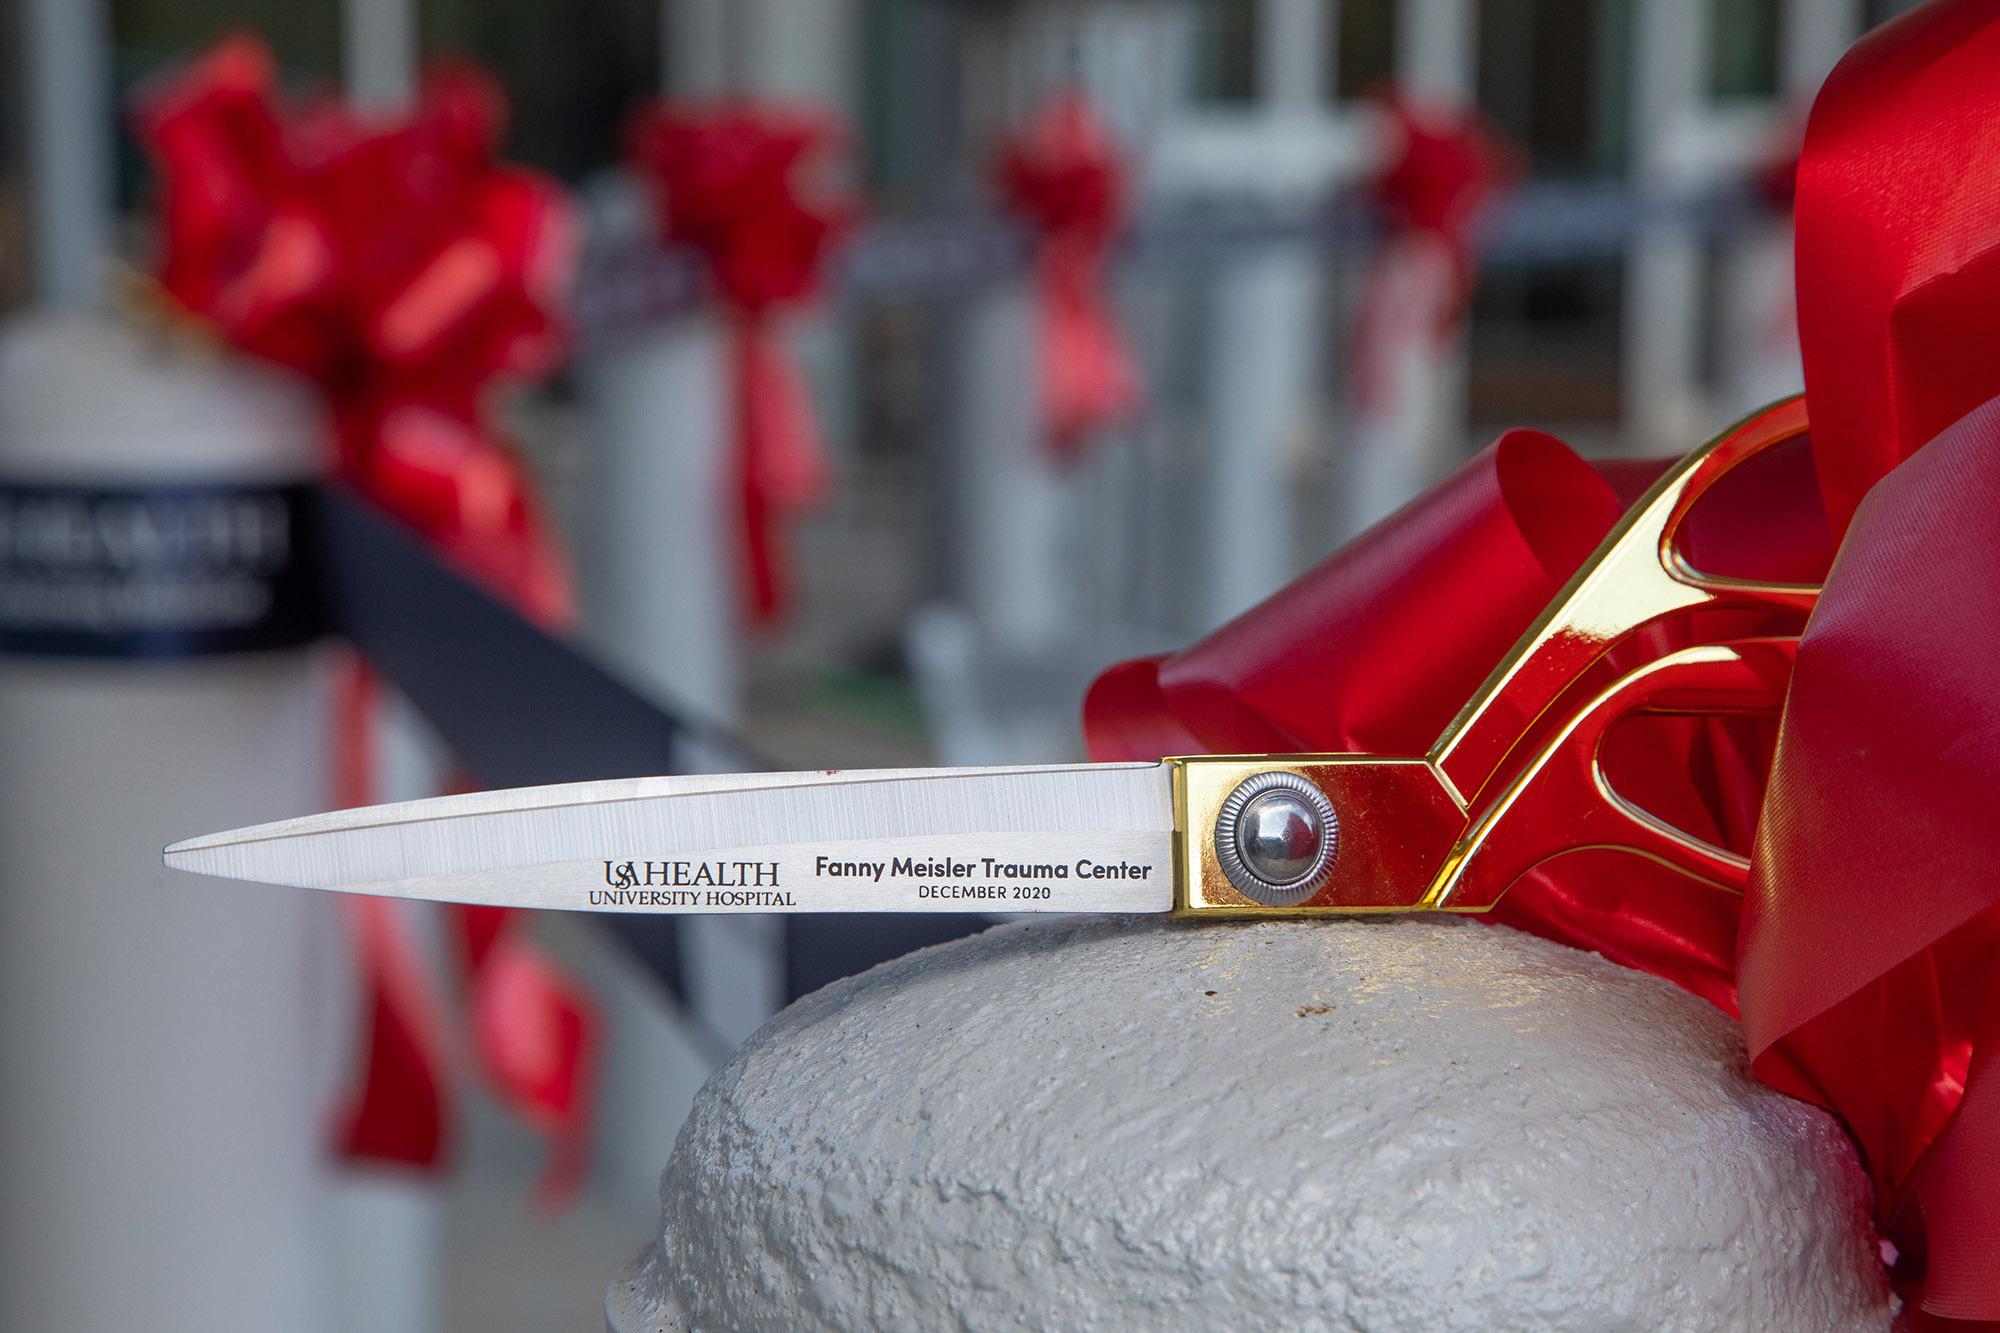 Ribbon cutting for the Fanny Meisler Trauma Center